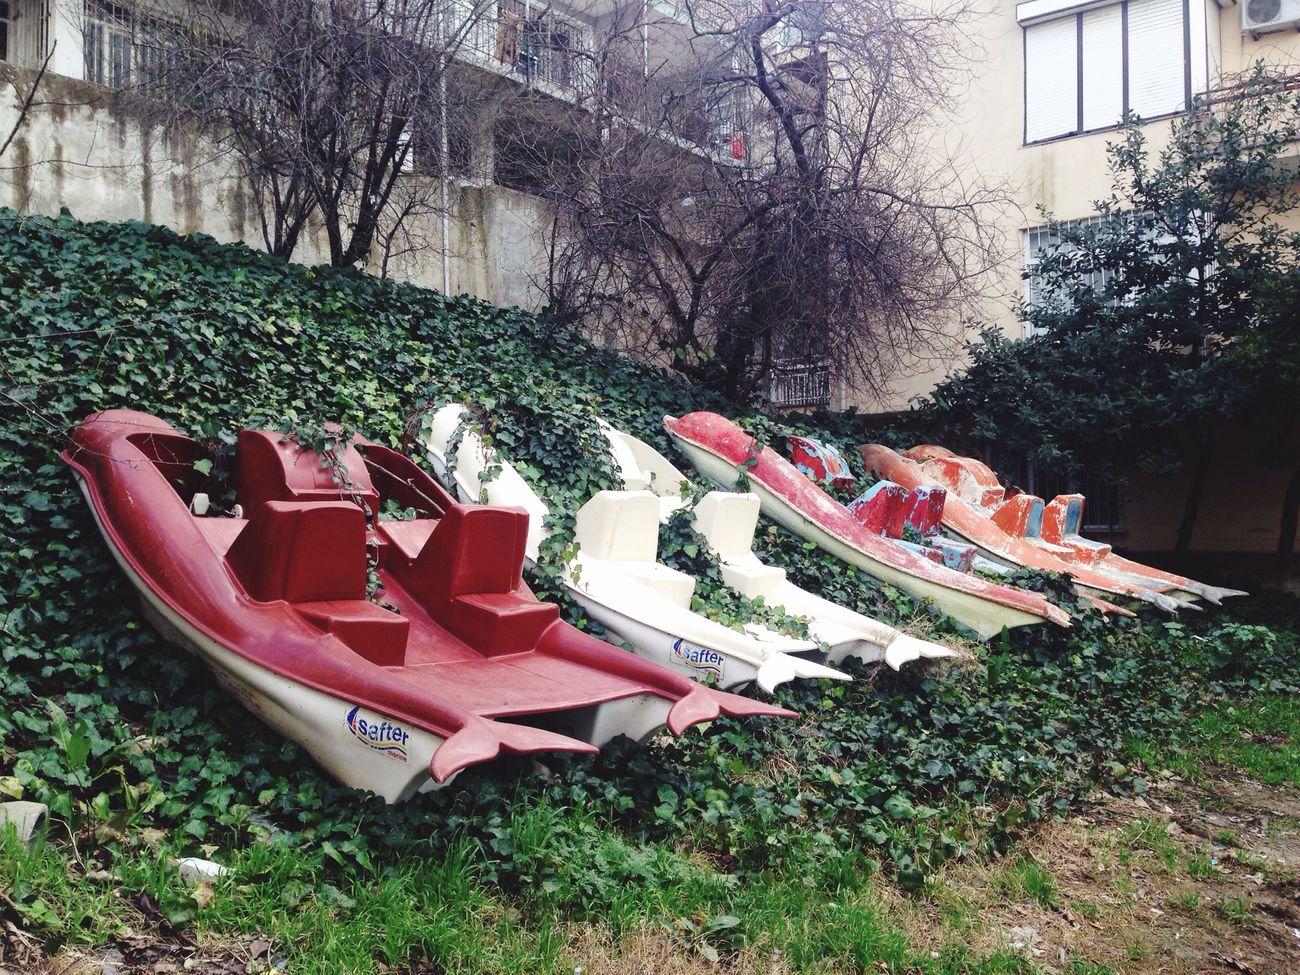 İmproperparking Parking Street Istanbul Buyukcekmecesahil Enjoying Life Green Plants Ship Colors